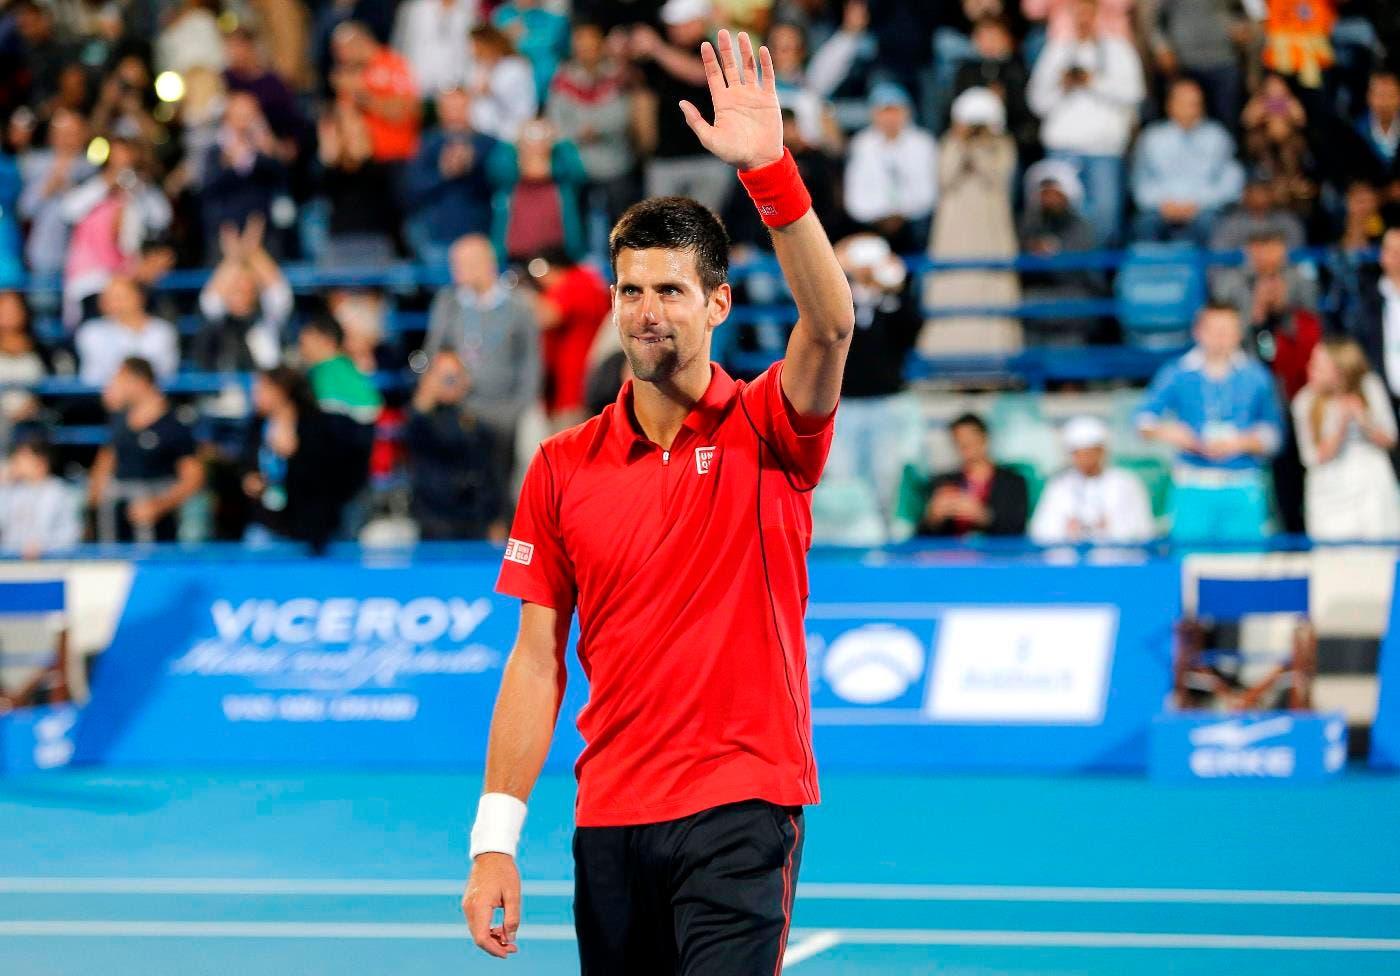 Tennis championship in Abu Dhabi